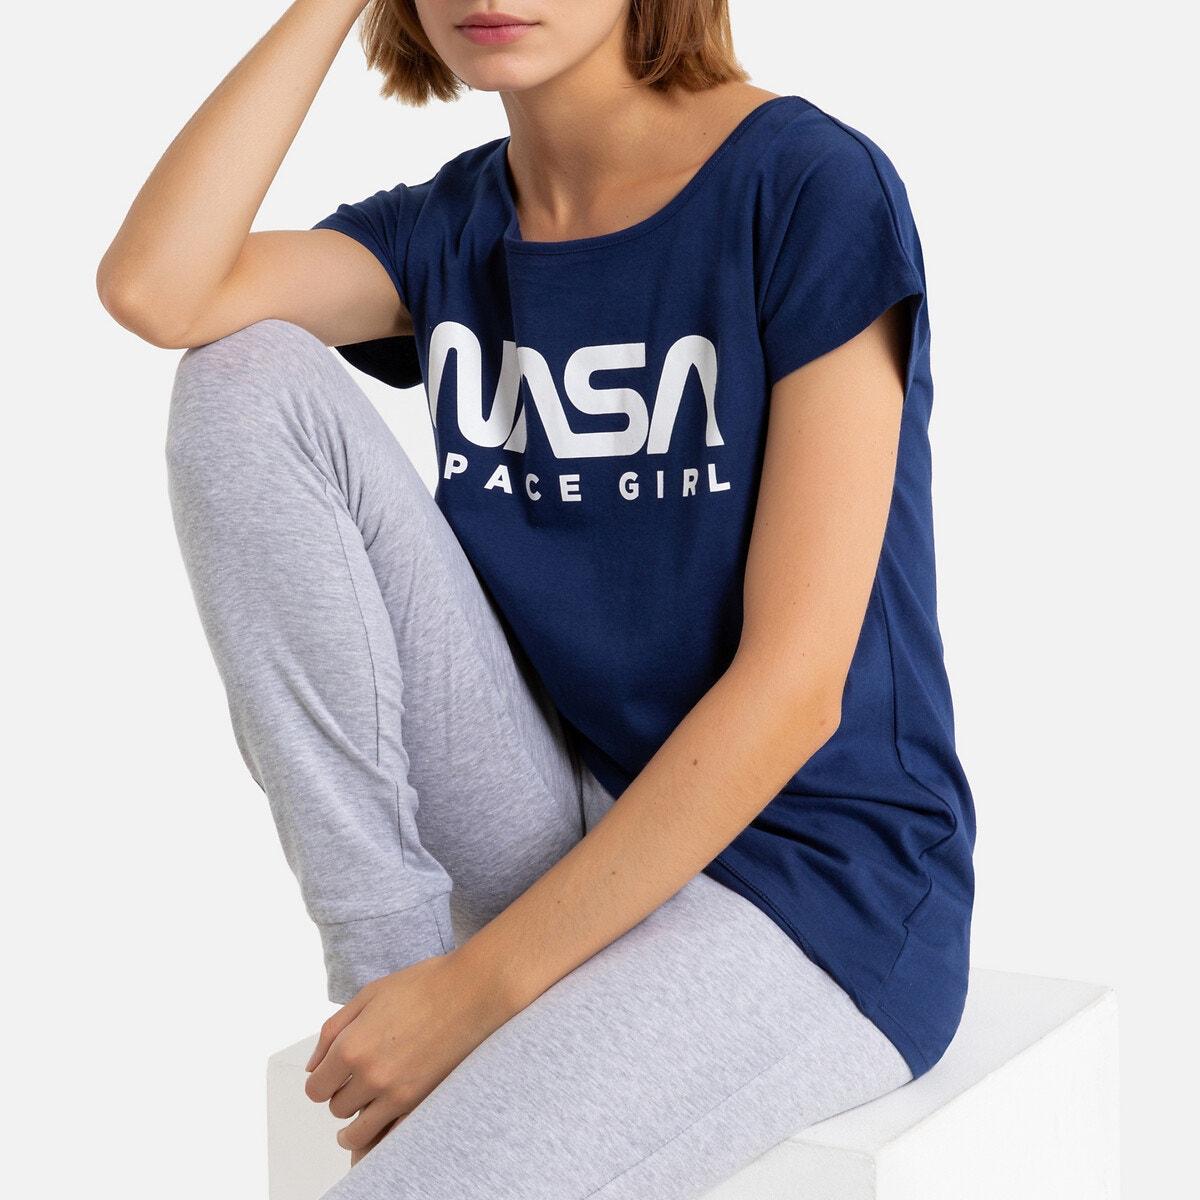 Nasa - Κοντομάνικη πιτζάμα 350174153 - 5915